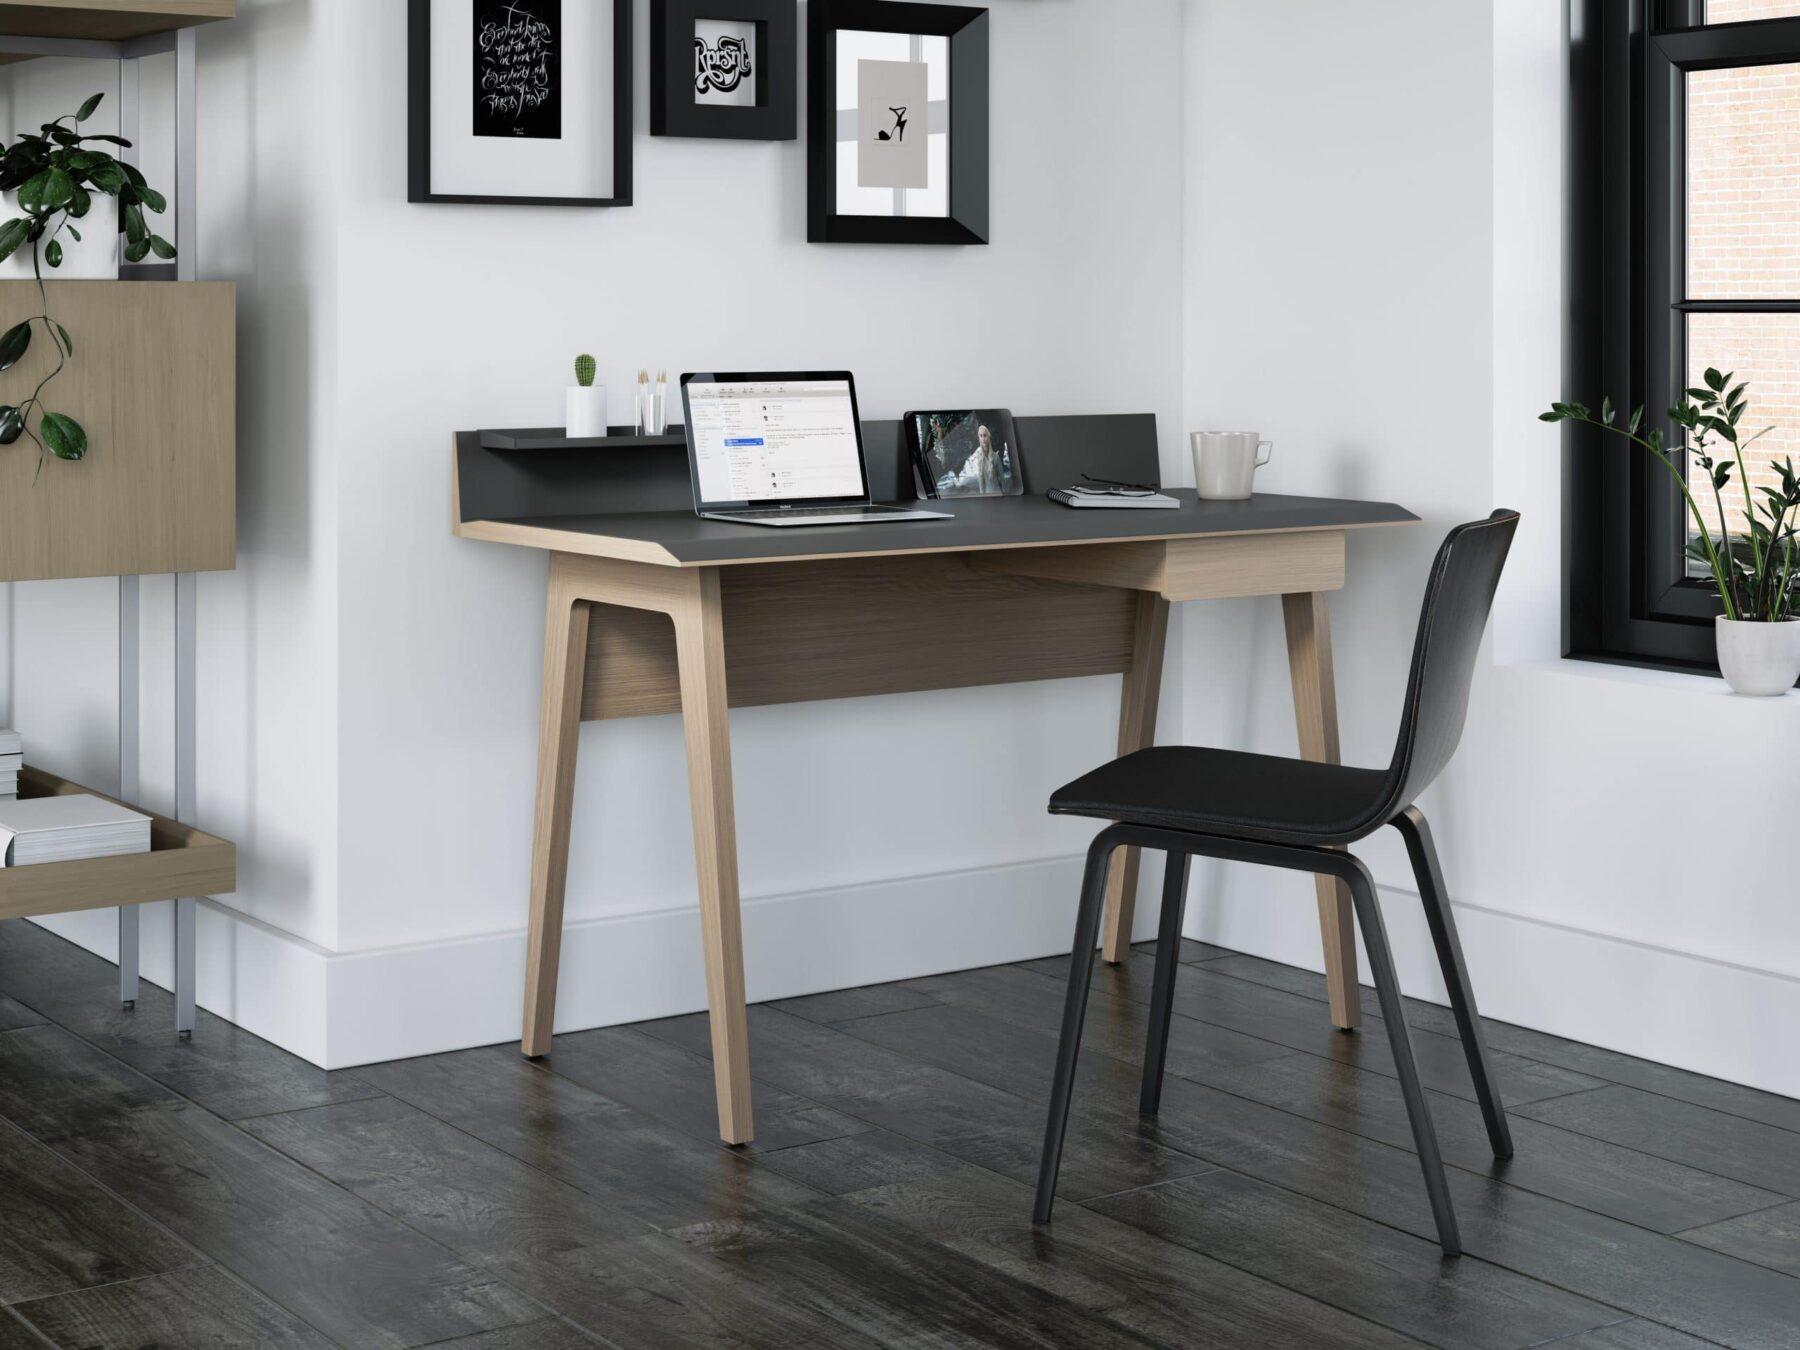 bevel-6743-BDI-contemporary-desk-DOK-LS1c